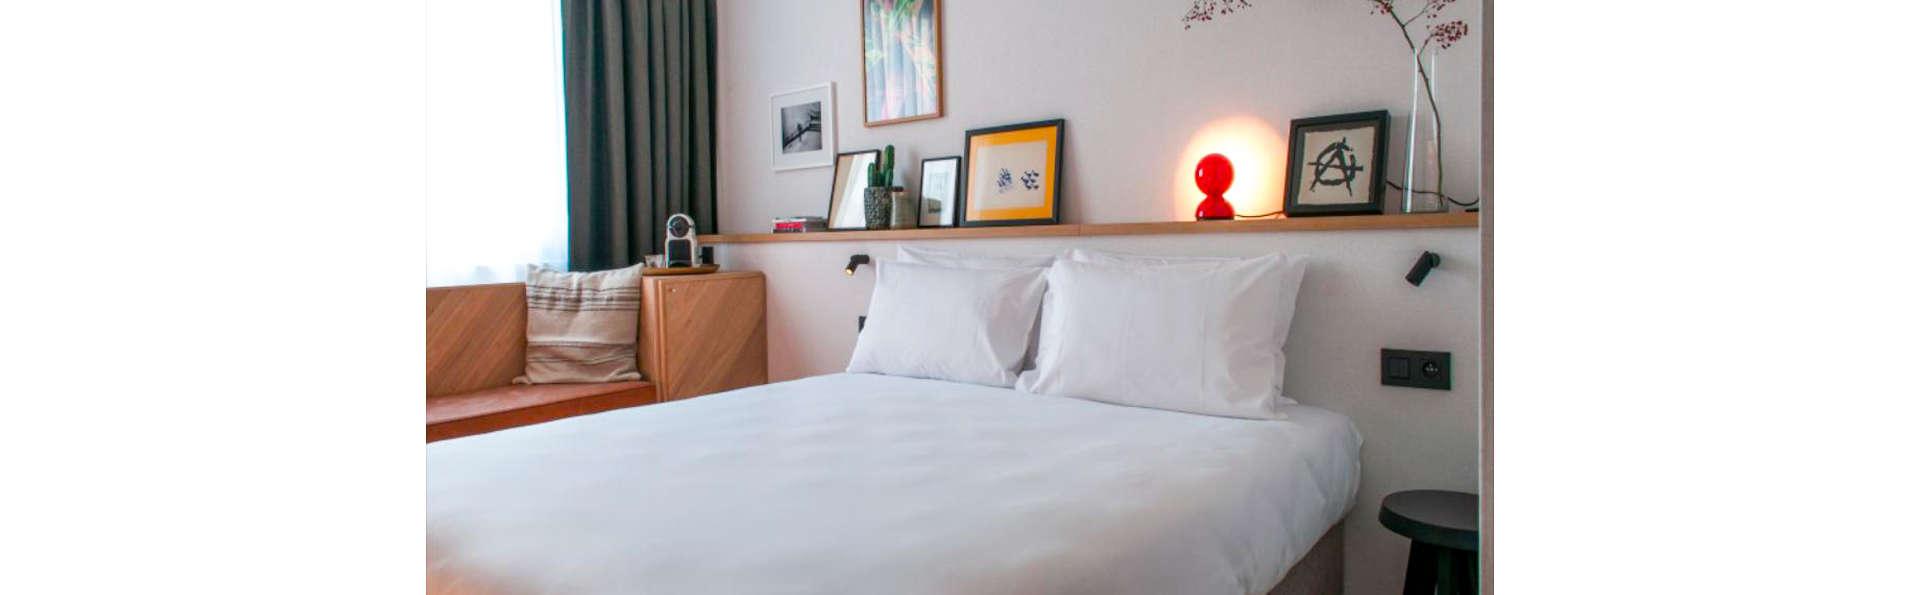 Hotel Indigo Antwerp City Centre - EDIT_ROOM_02.jpg